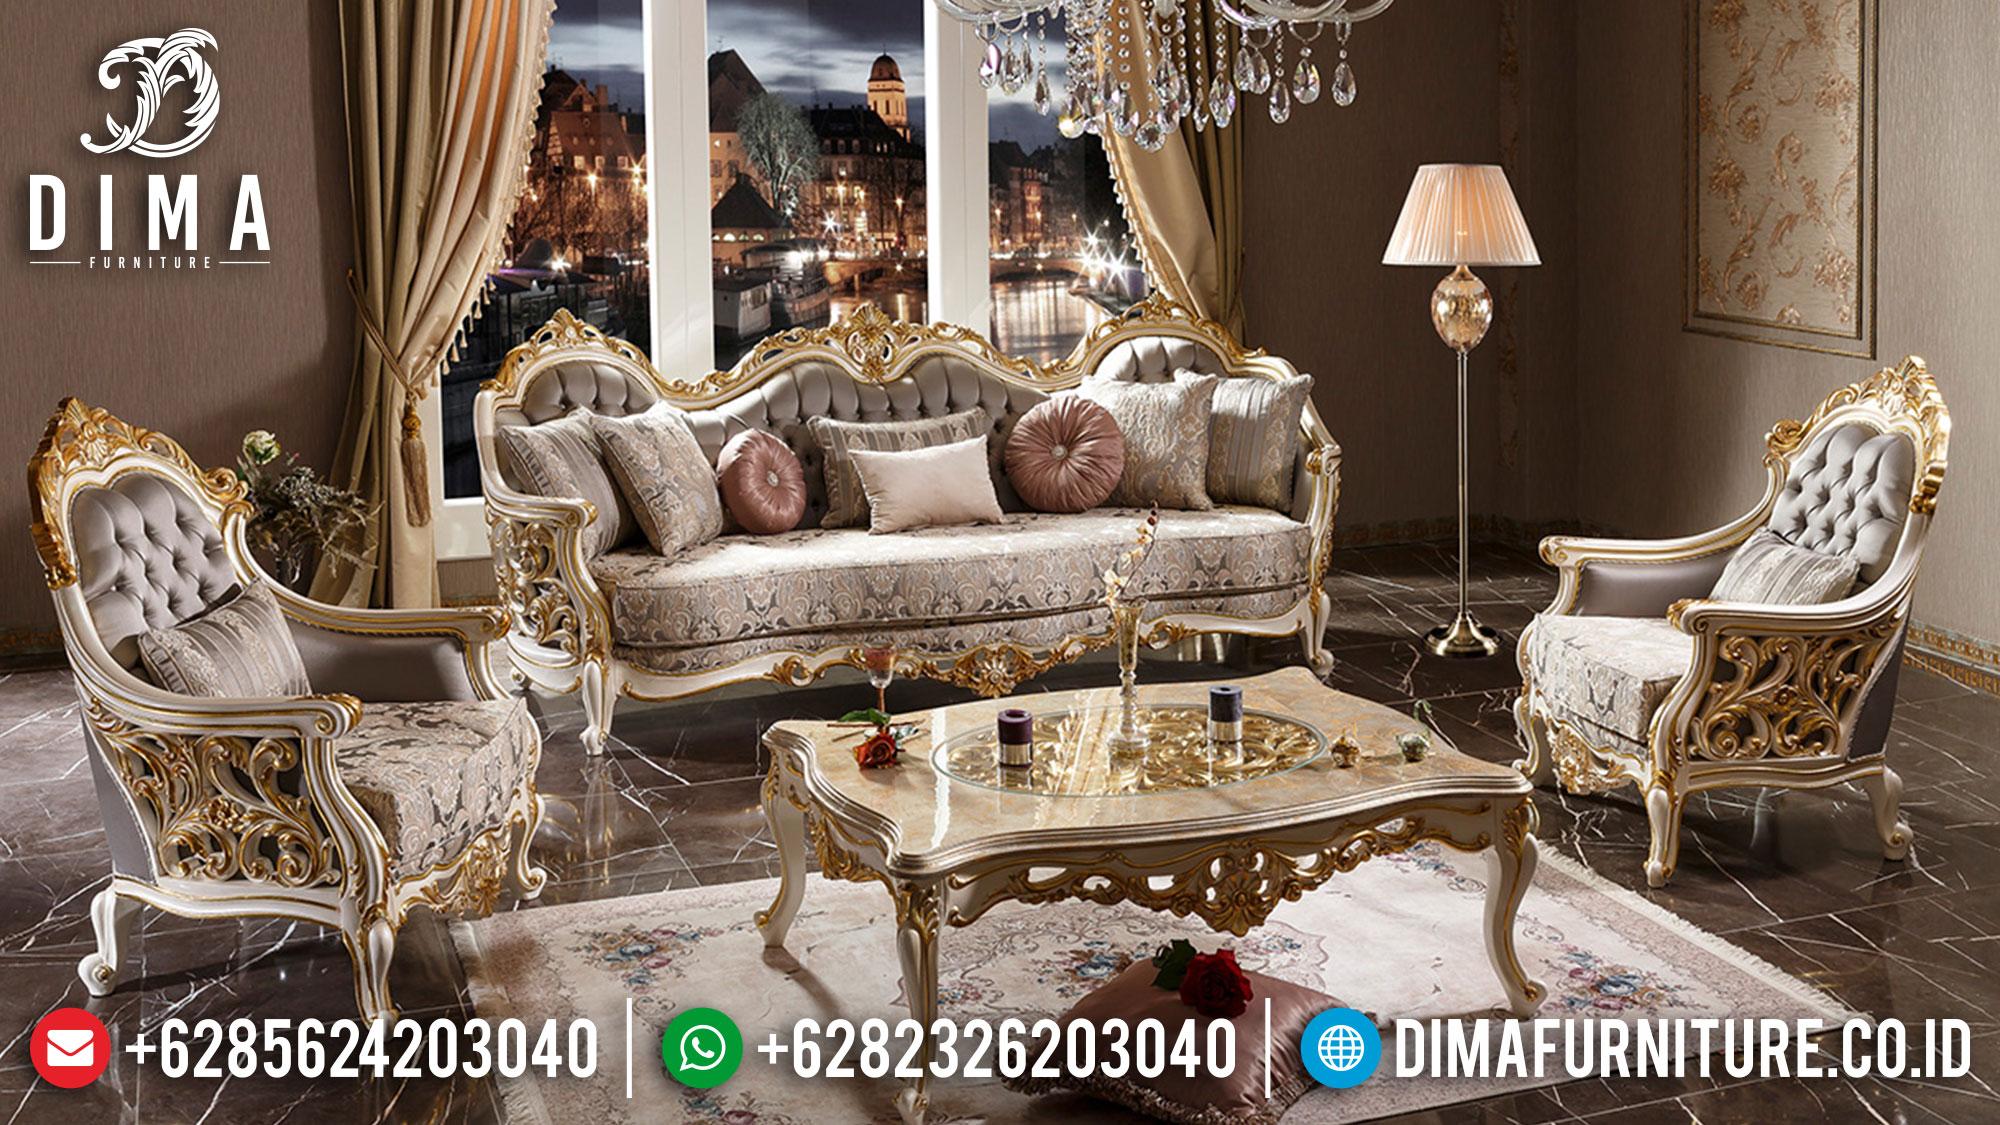 Desain Mewah Sofa Tamu Jepara Superior Premiere Classic Luxury Style Ttj-1531